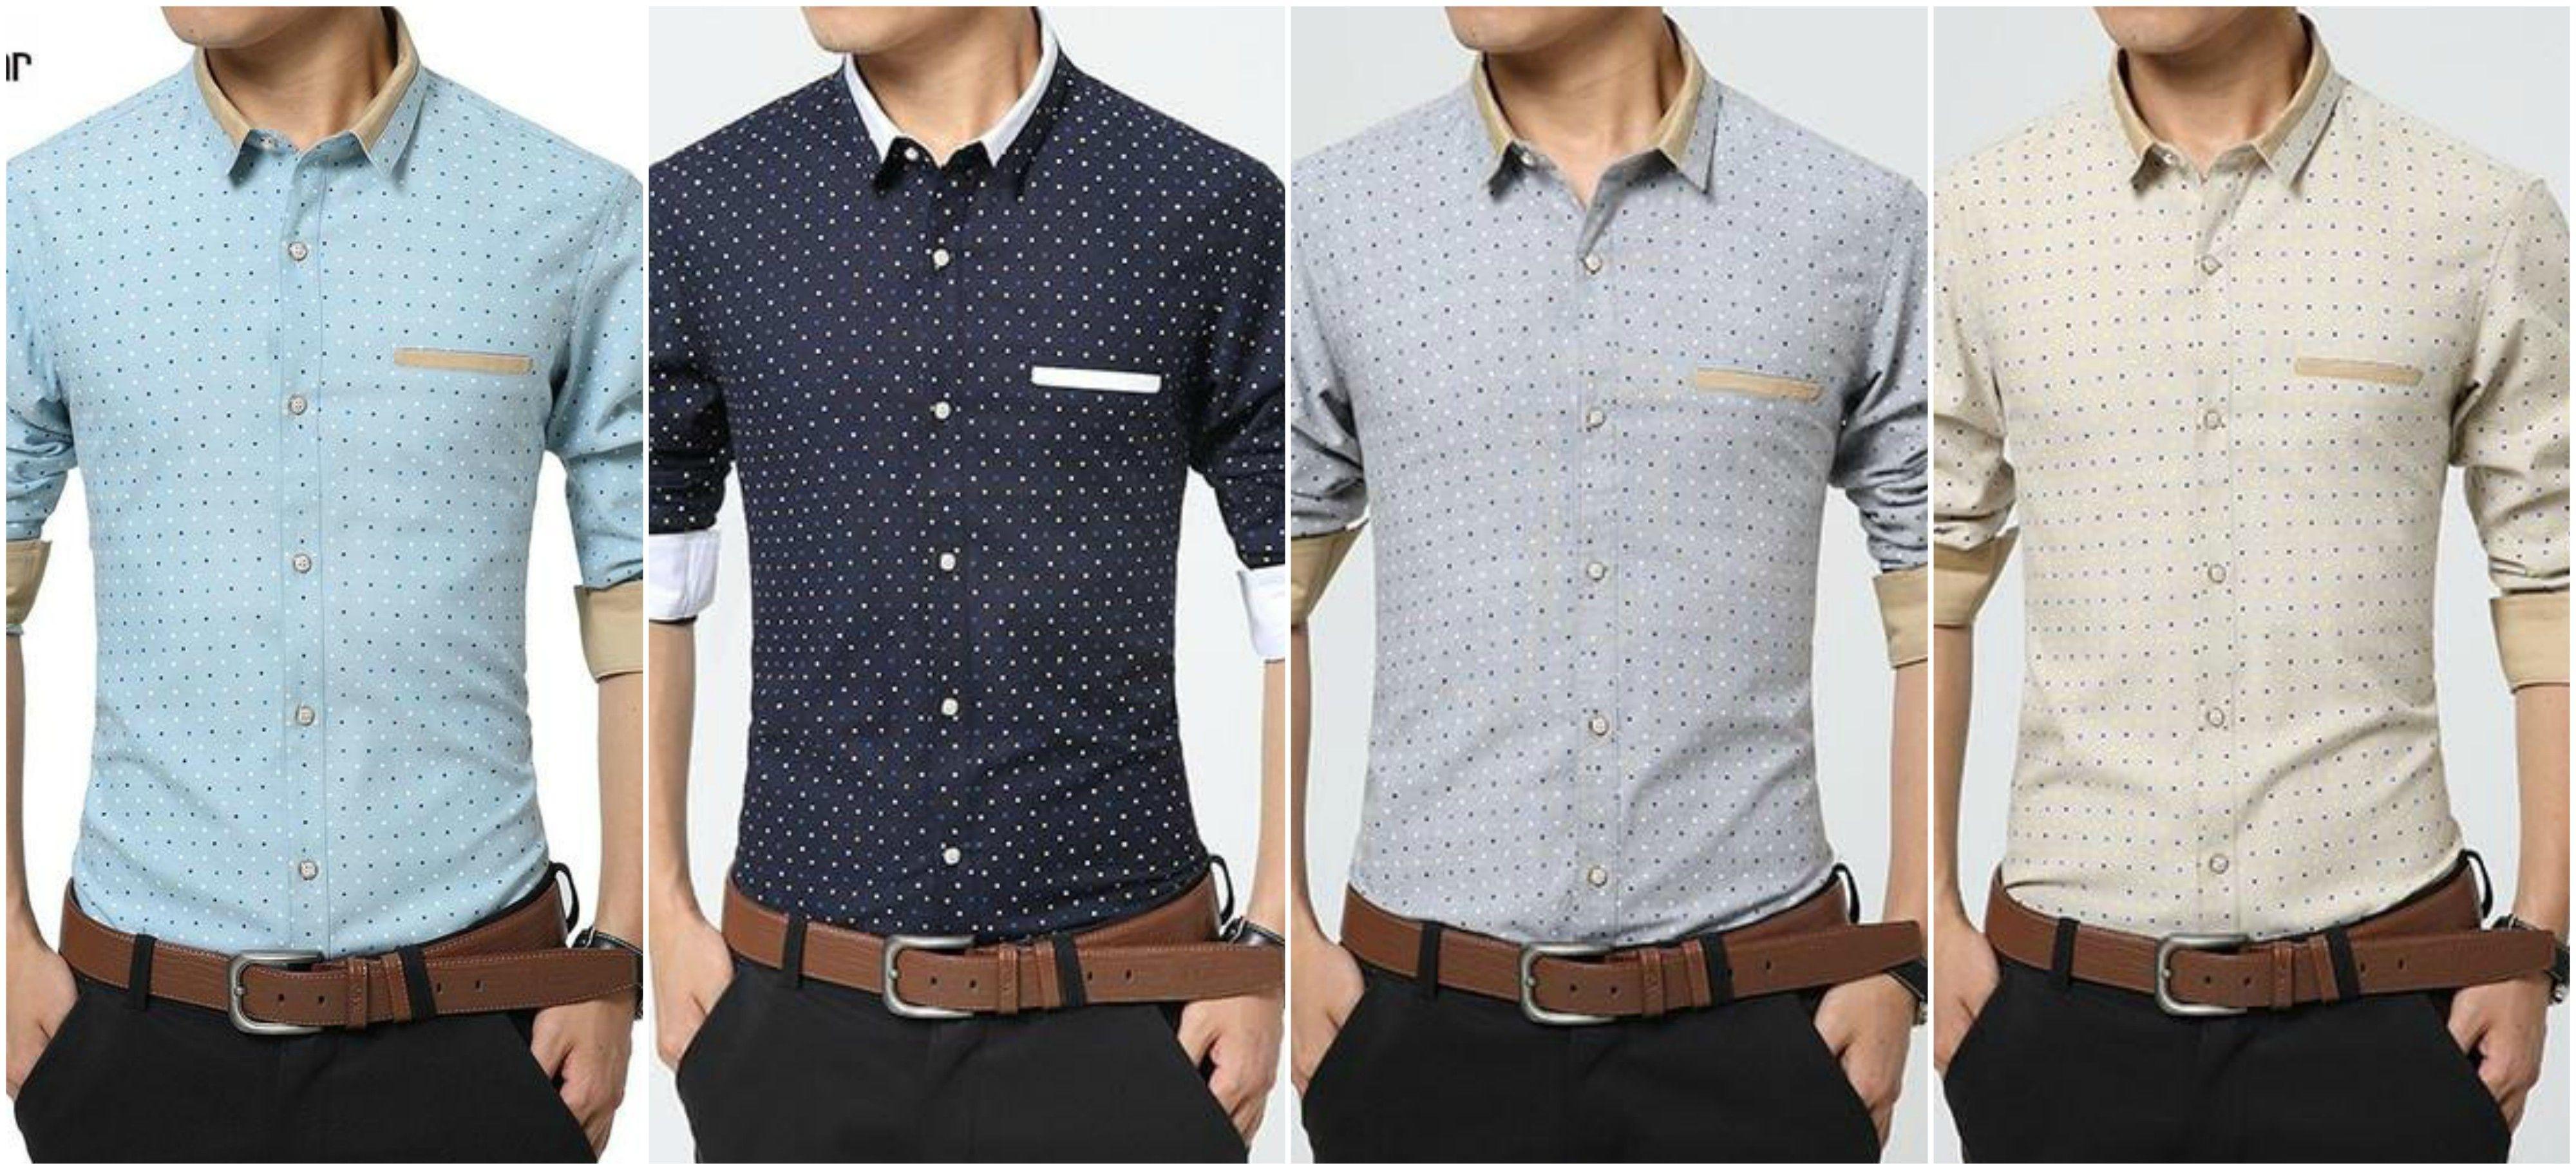 ac48a96ff195 Fashion Men Clothes Polka Dot Casual Men Shirts Long Sleeve Slim Fit Man  Shirts